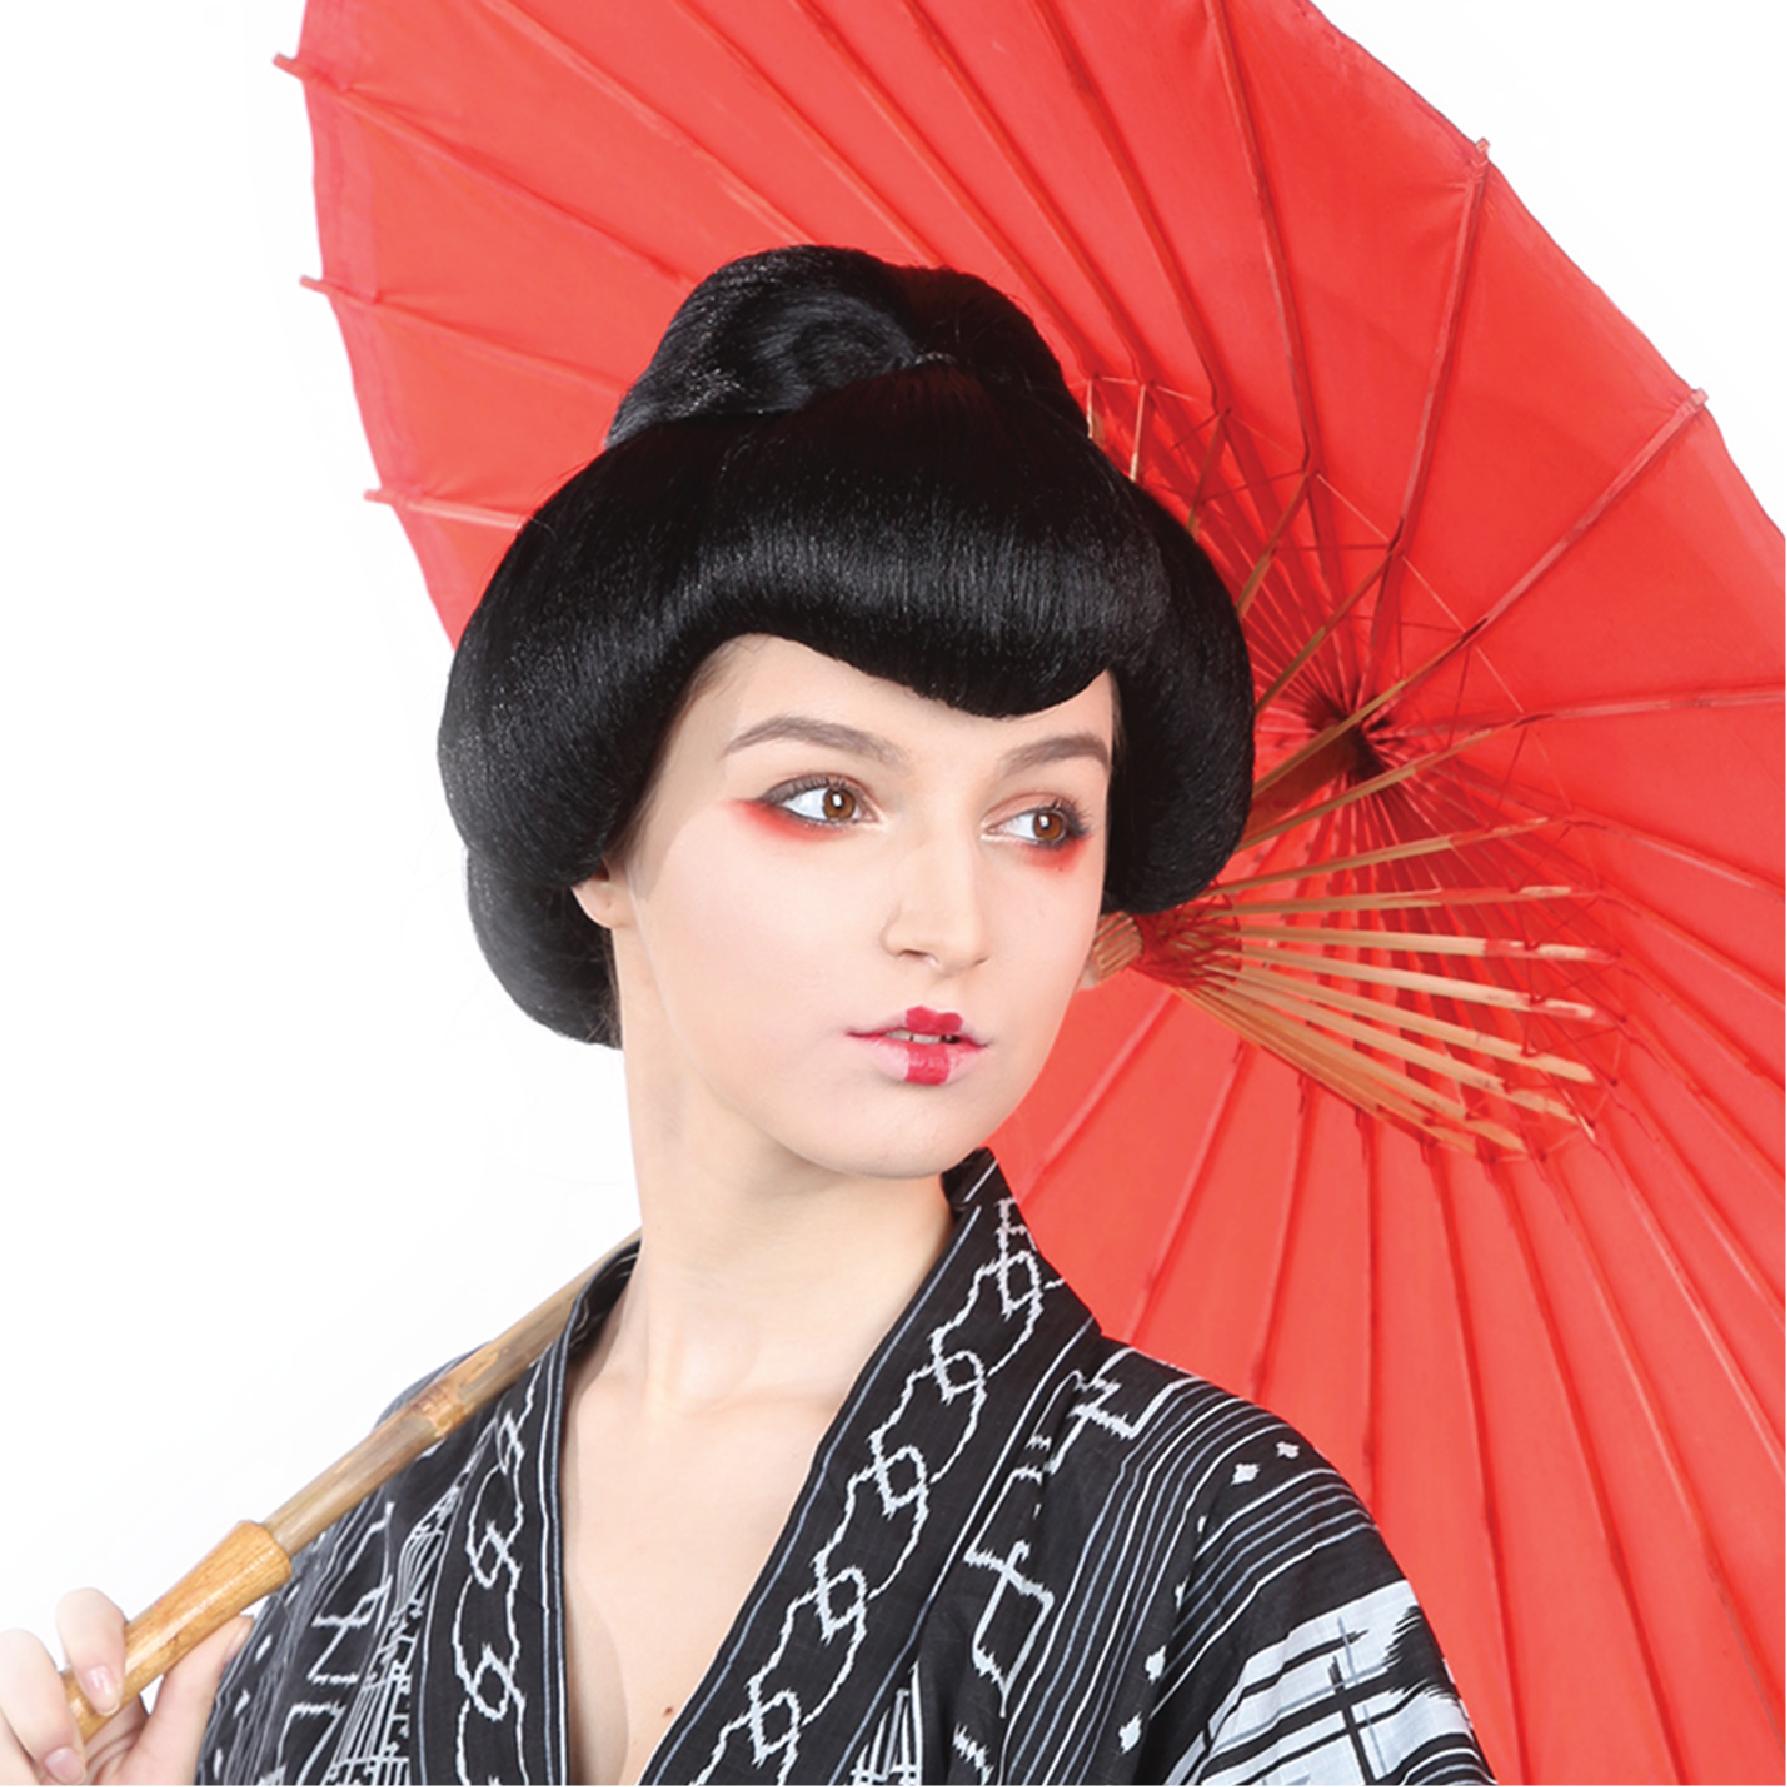 The geisha girl seattle